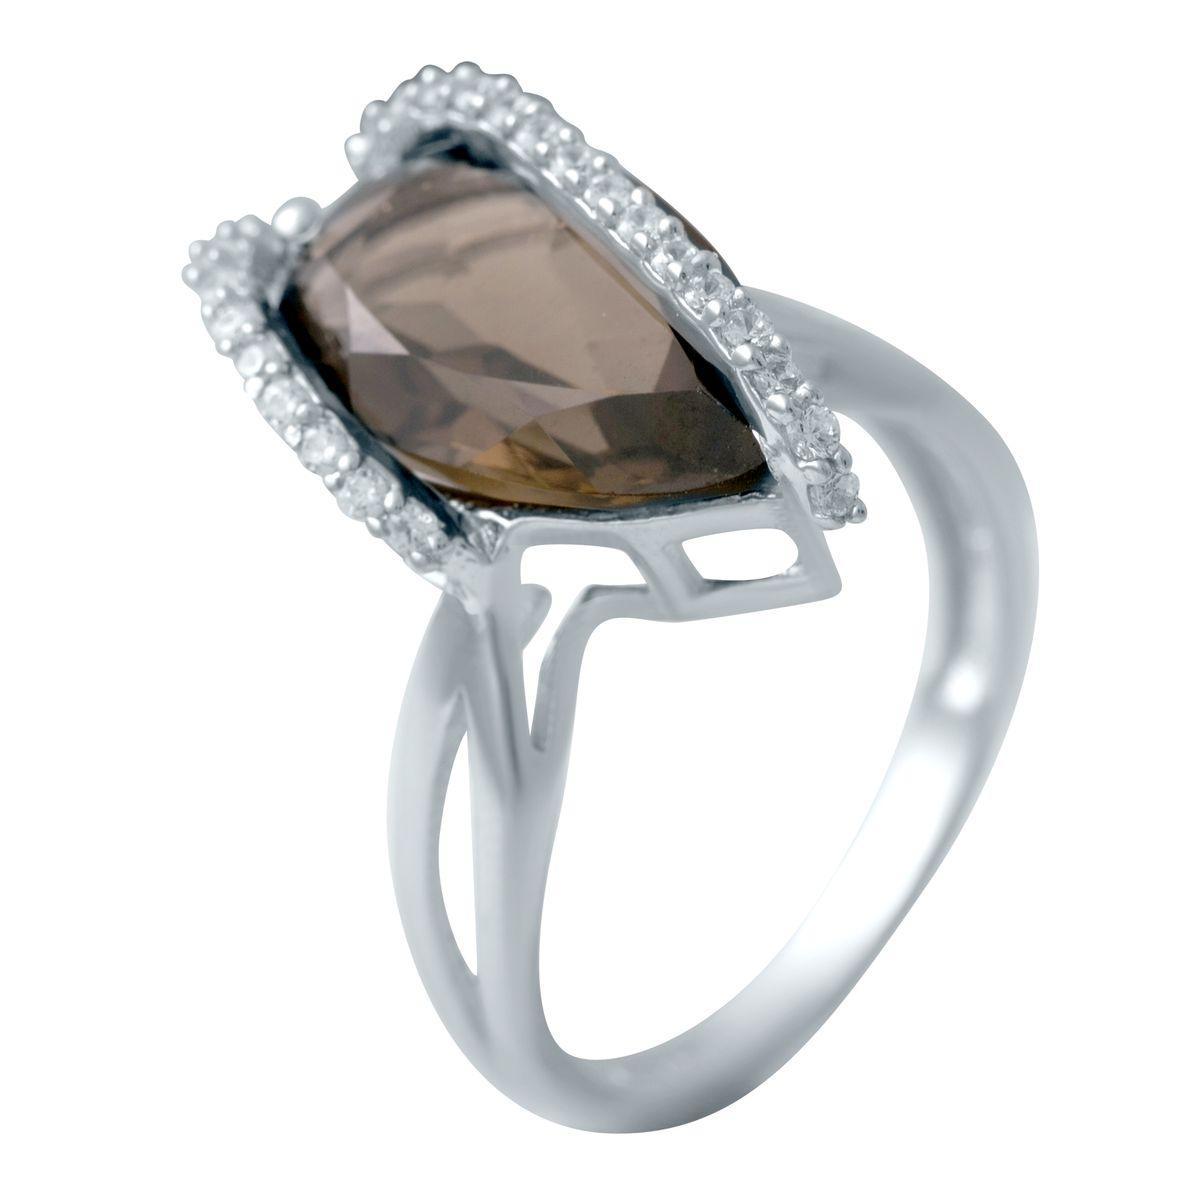 Серебряное кольцо DreamJewelry с натуральным раухтопазом (димчатим кварцем) (2033400) 17.5 размер